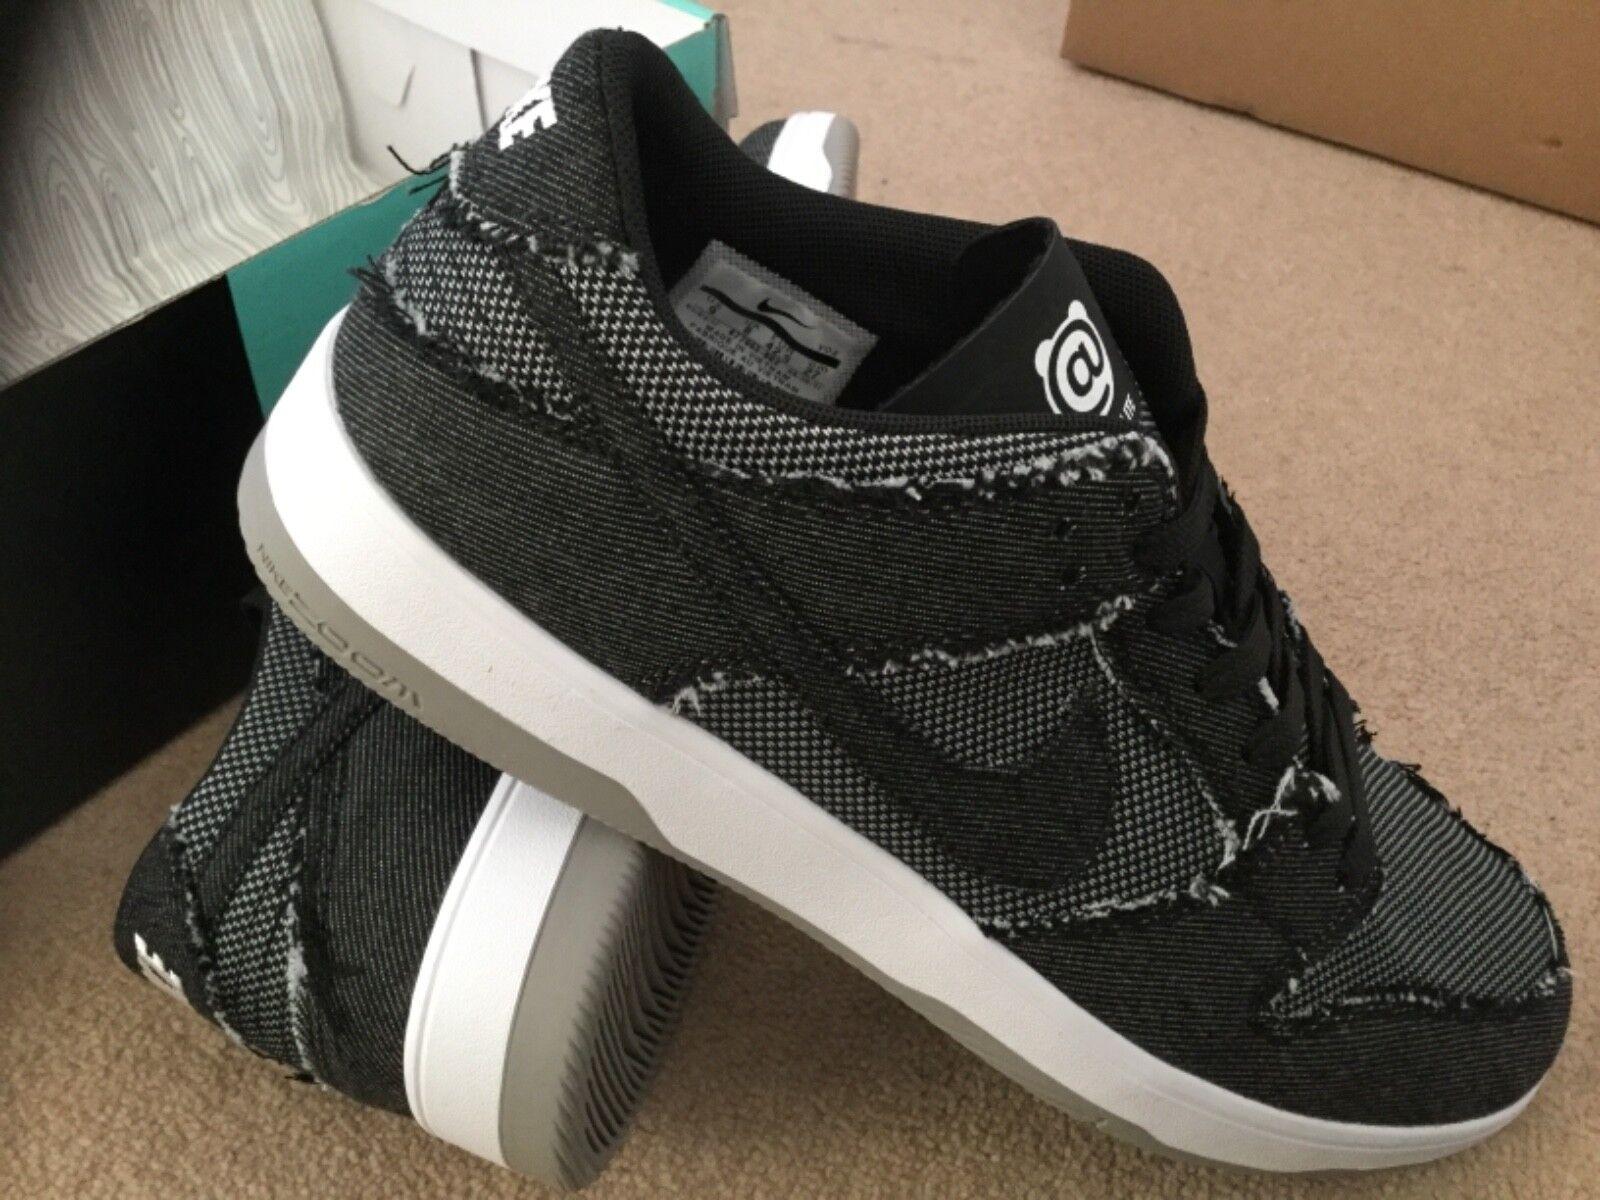 Nike SB DUNK basse Elite x Medicom be@rbrick UK9/ 10 NUOVO CON SCATOLA scorte morte.